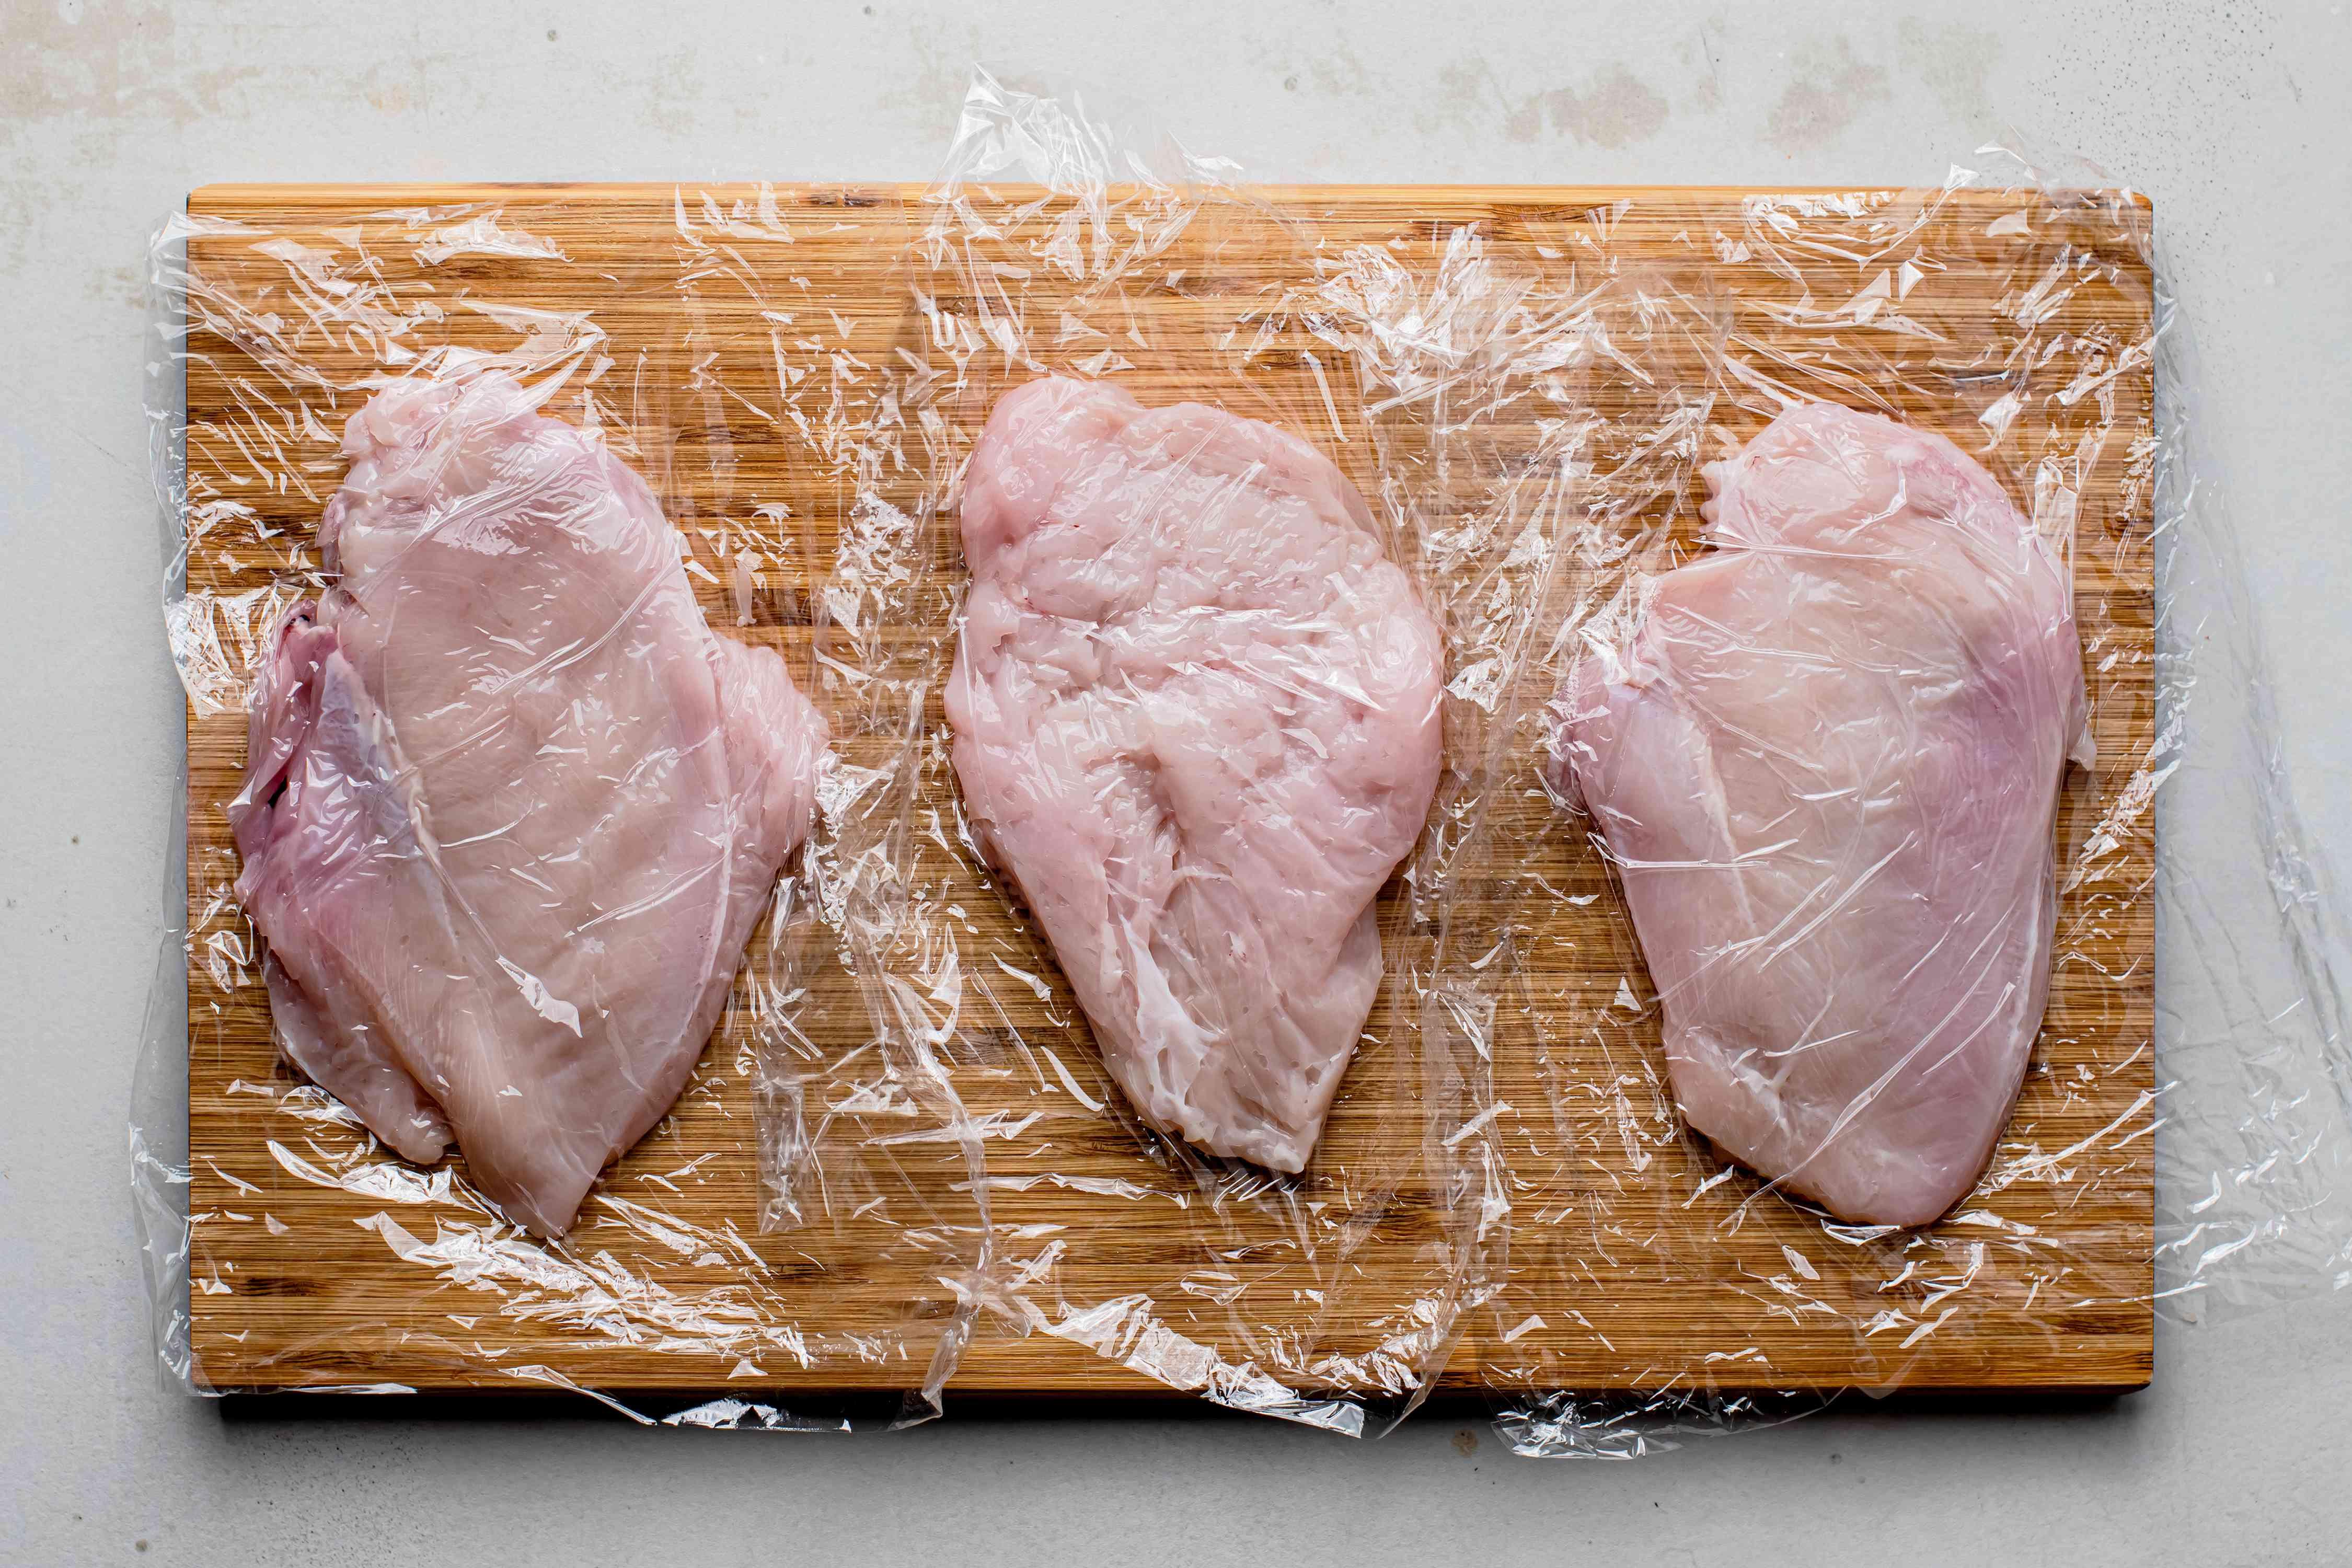 Chicken in plastic wrap on a wooden board